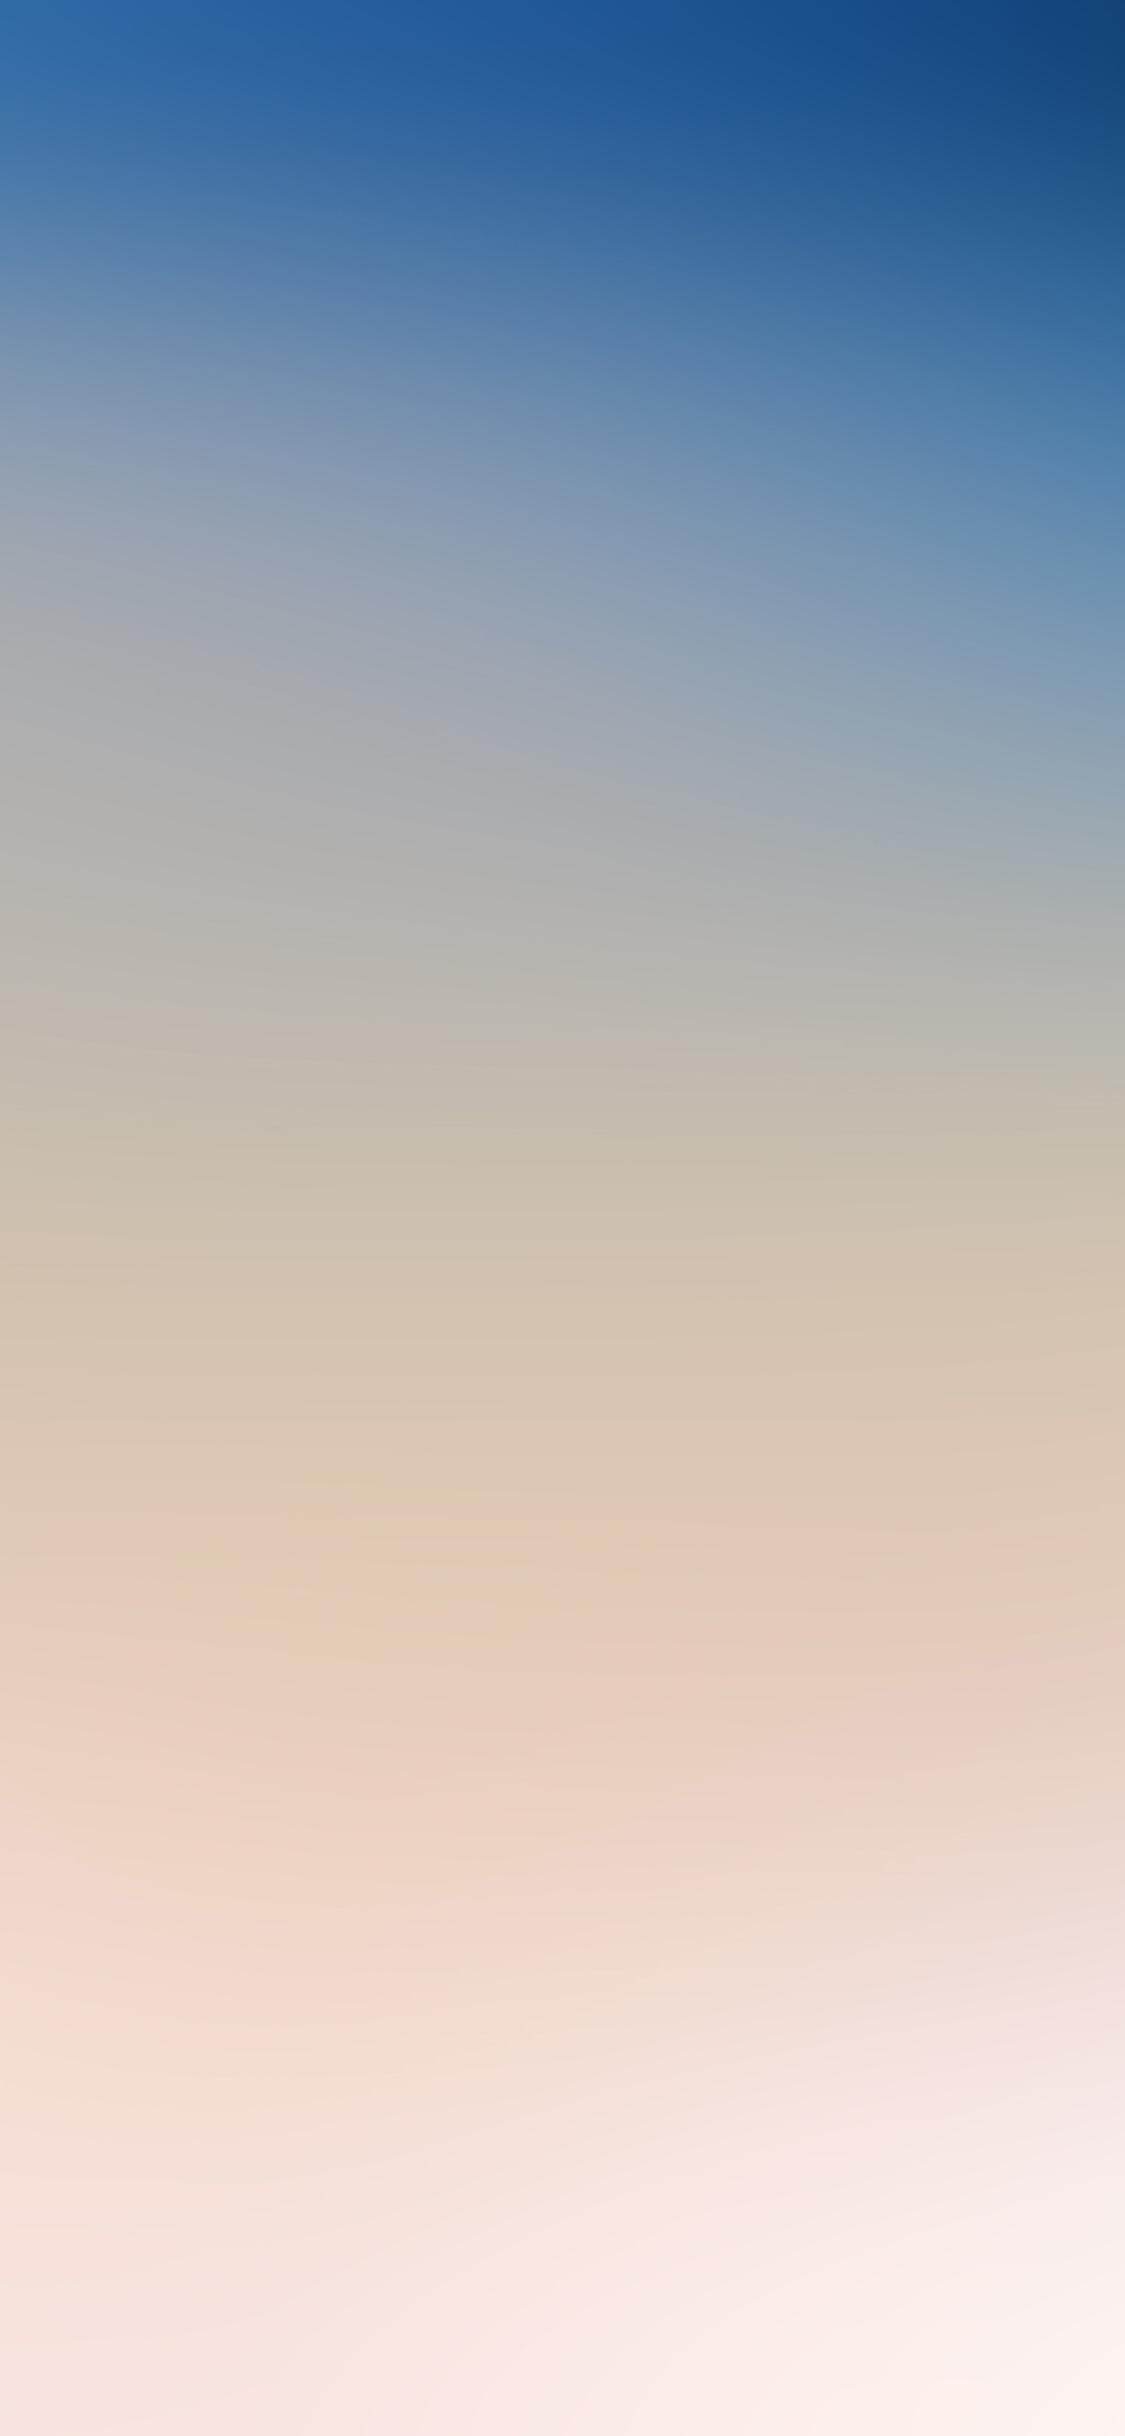 iPhoneXpapers.com-Apple-iPhone-wallpaper-sc06-amargedon-light-blur